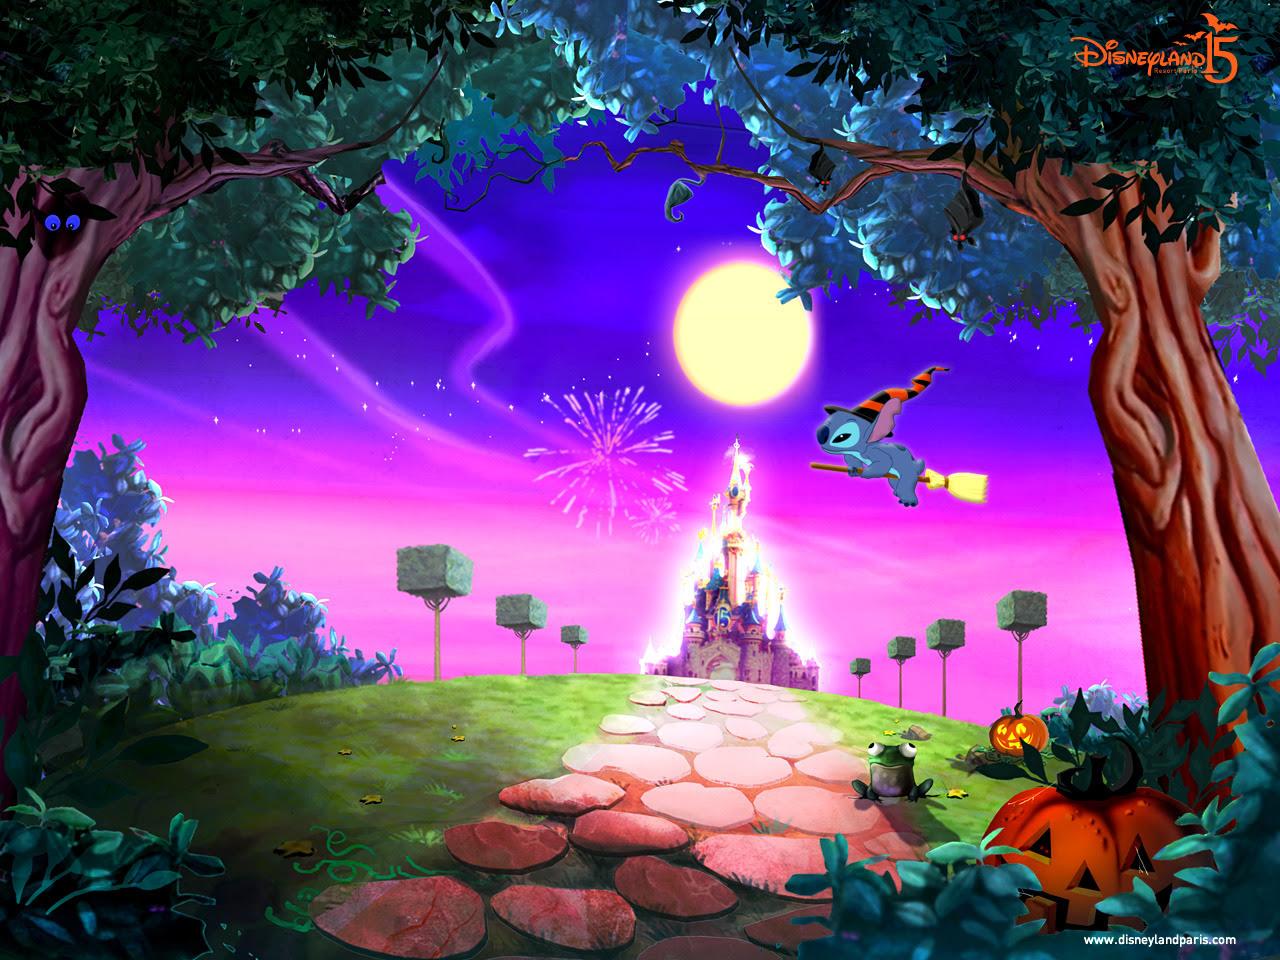 http://25.media.tumblr.com/tumblr_m7omnkRVt91rayynlo1_1280.jpg